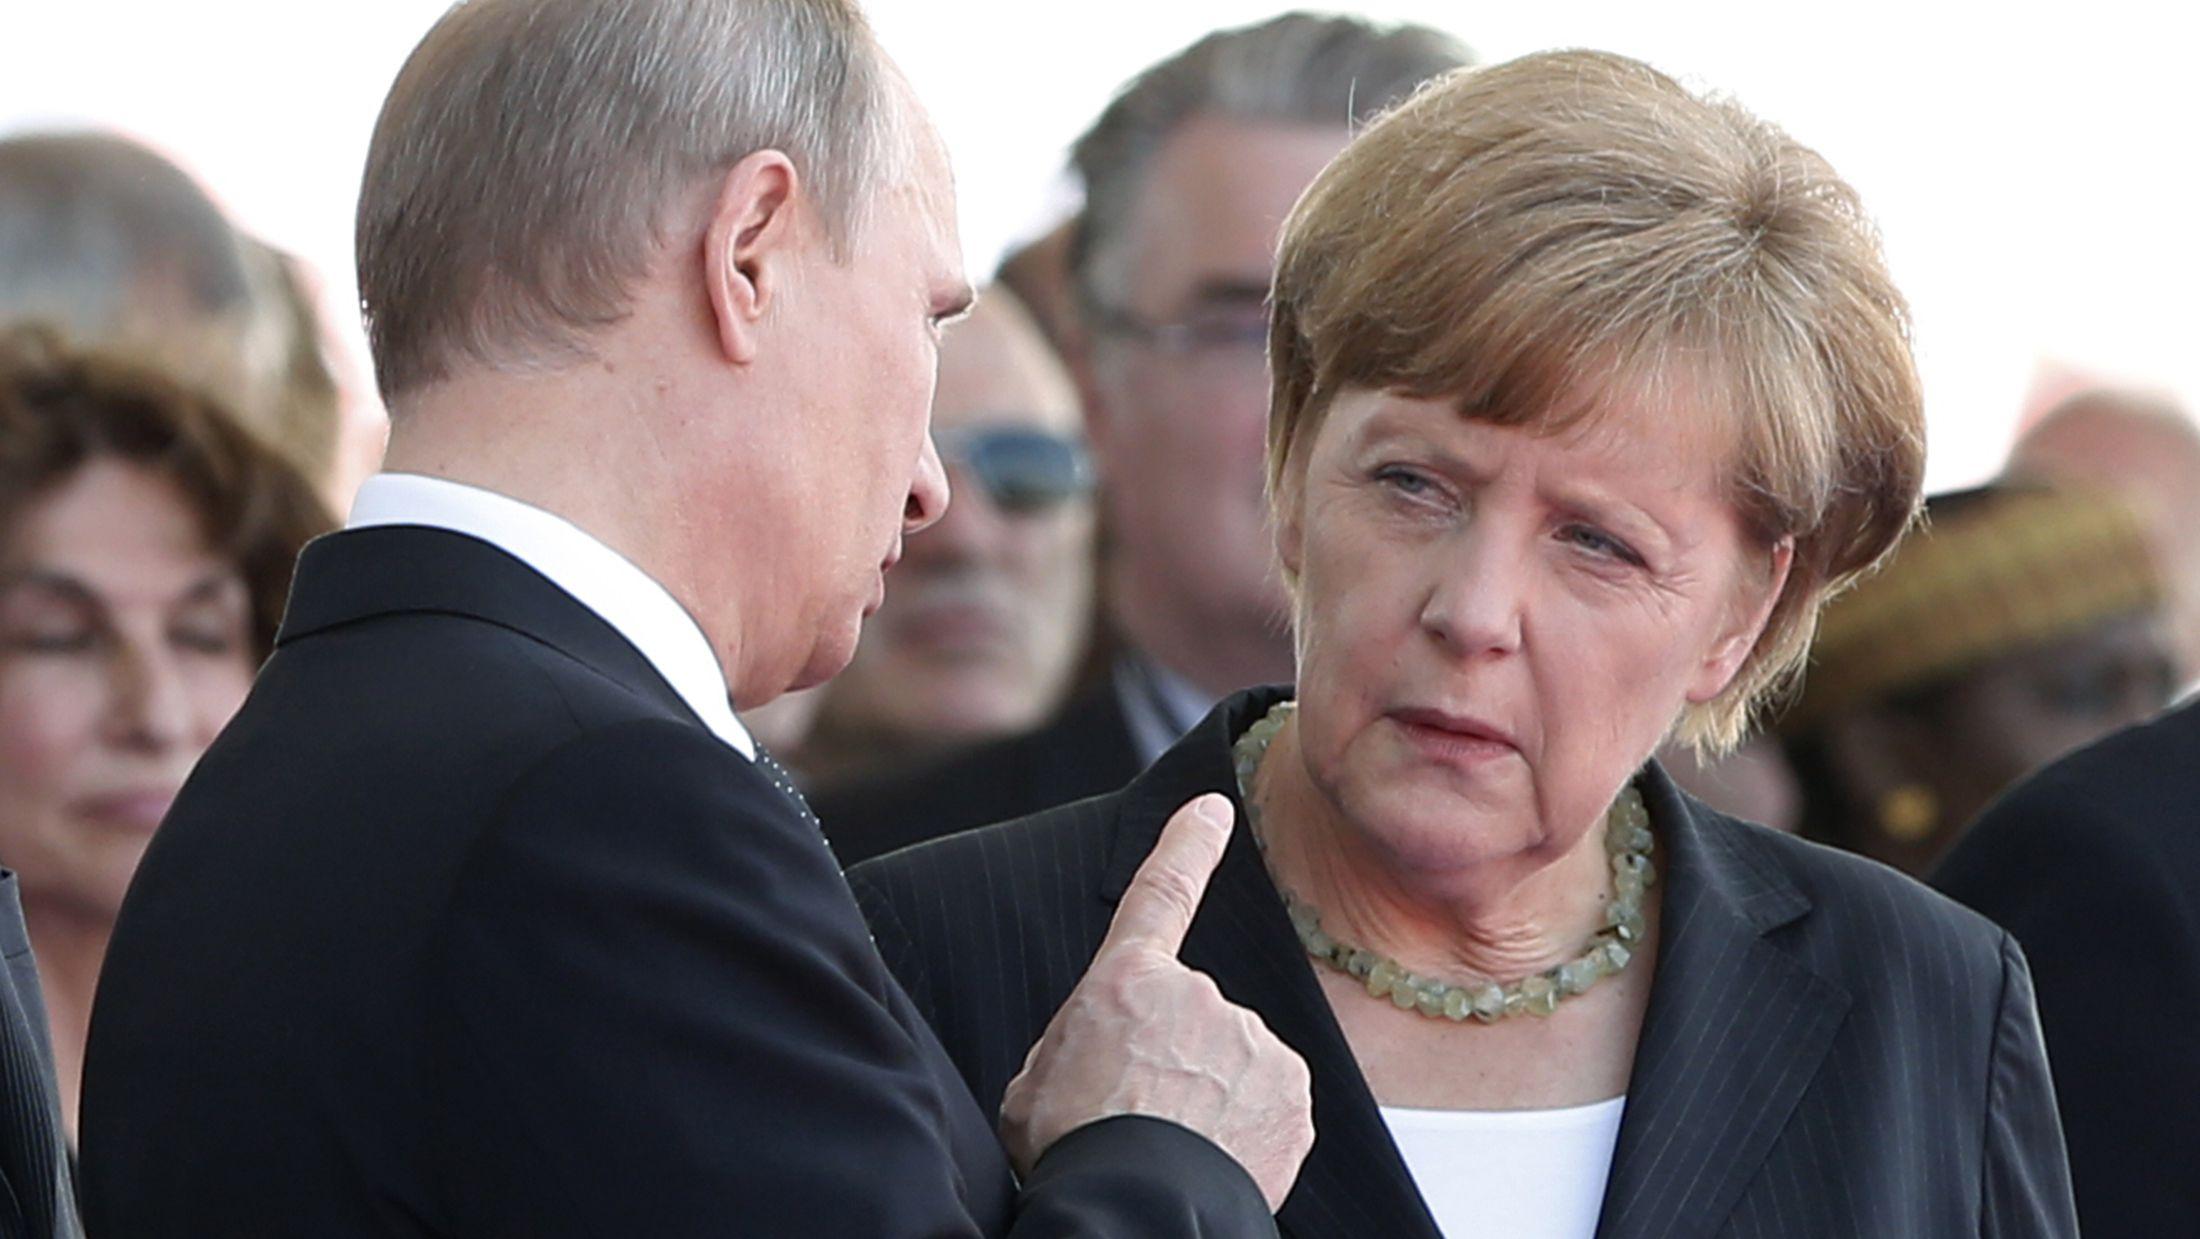 Russian President Vladimir Putin talks with German Chancellor Angela Merkel